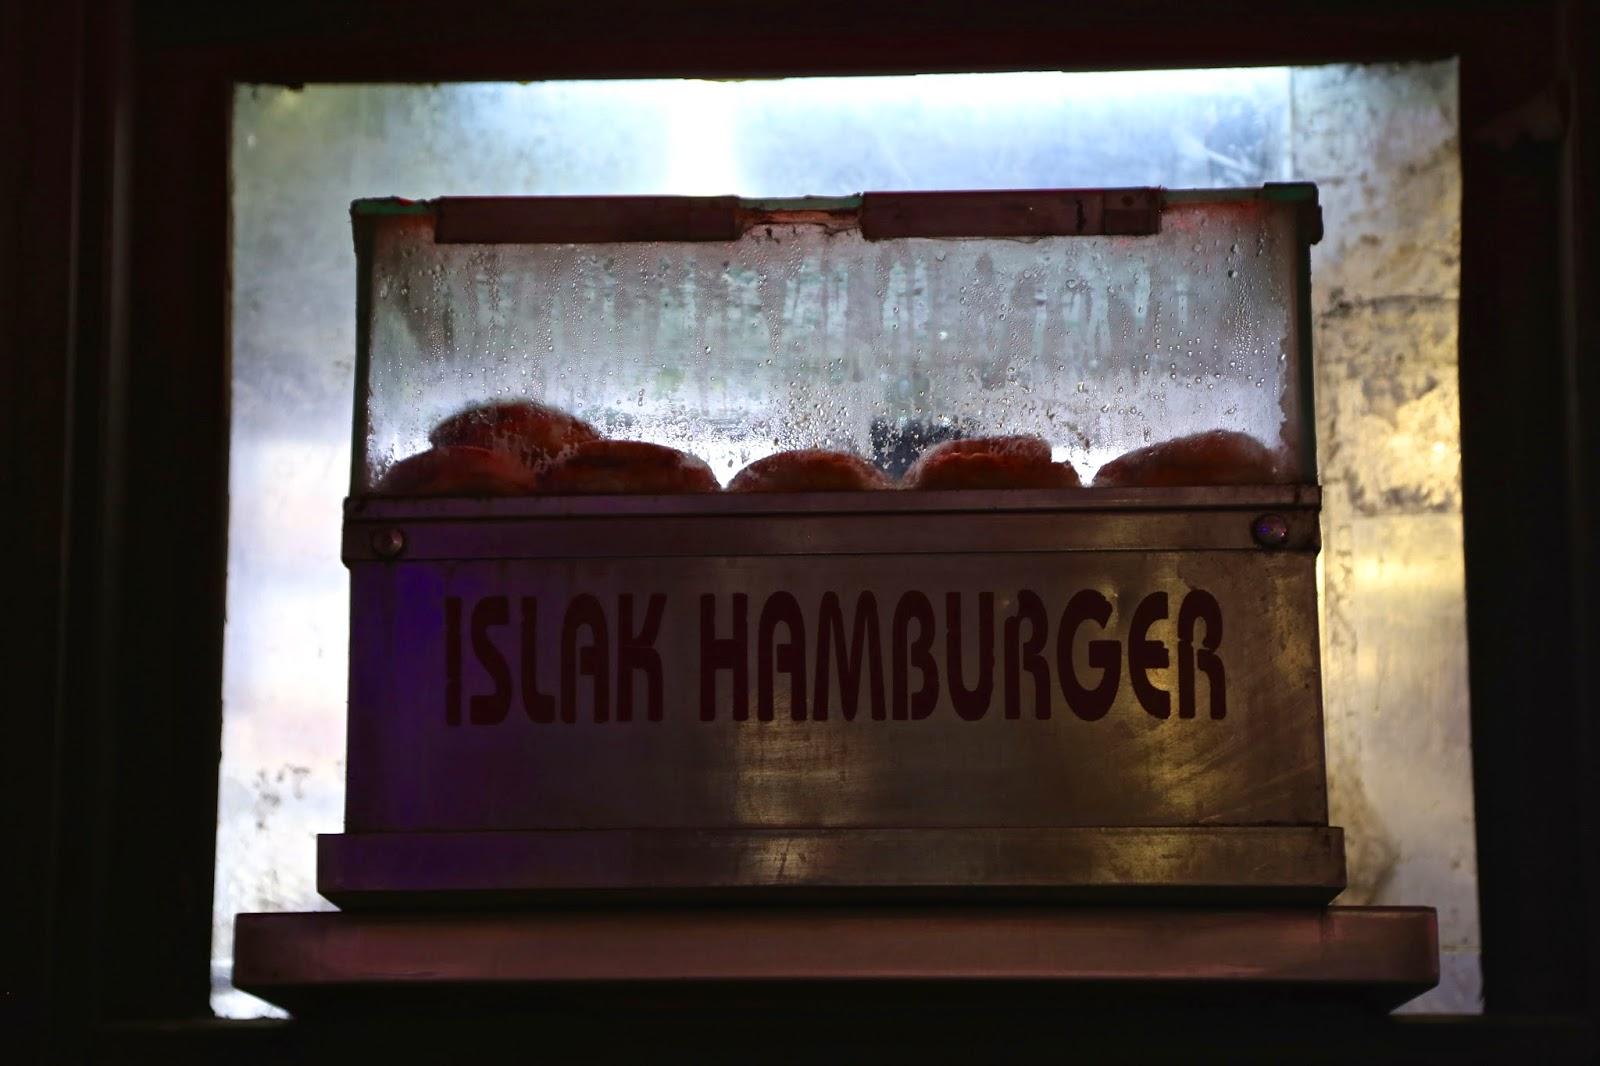 wet hamburger, istanbul